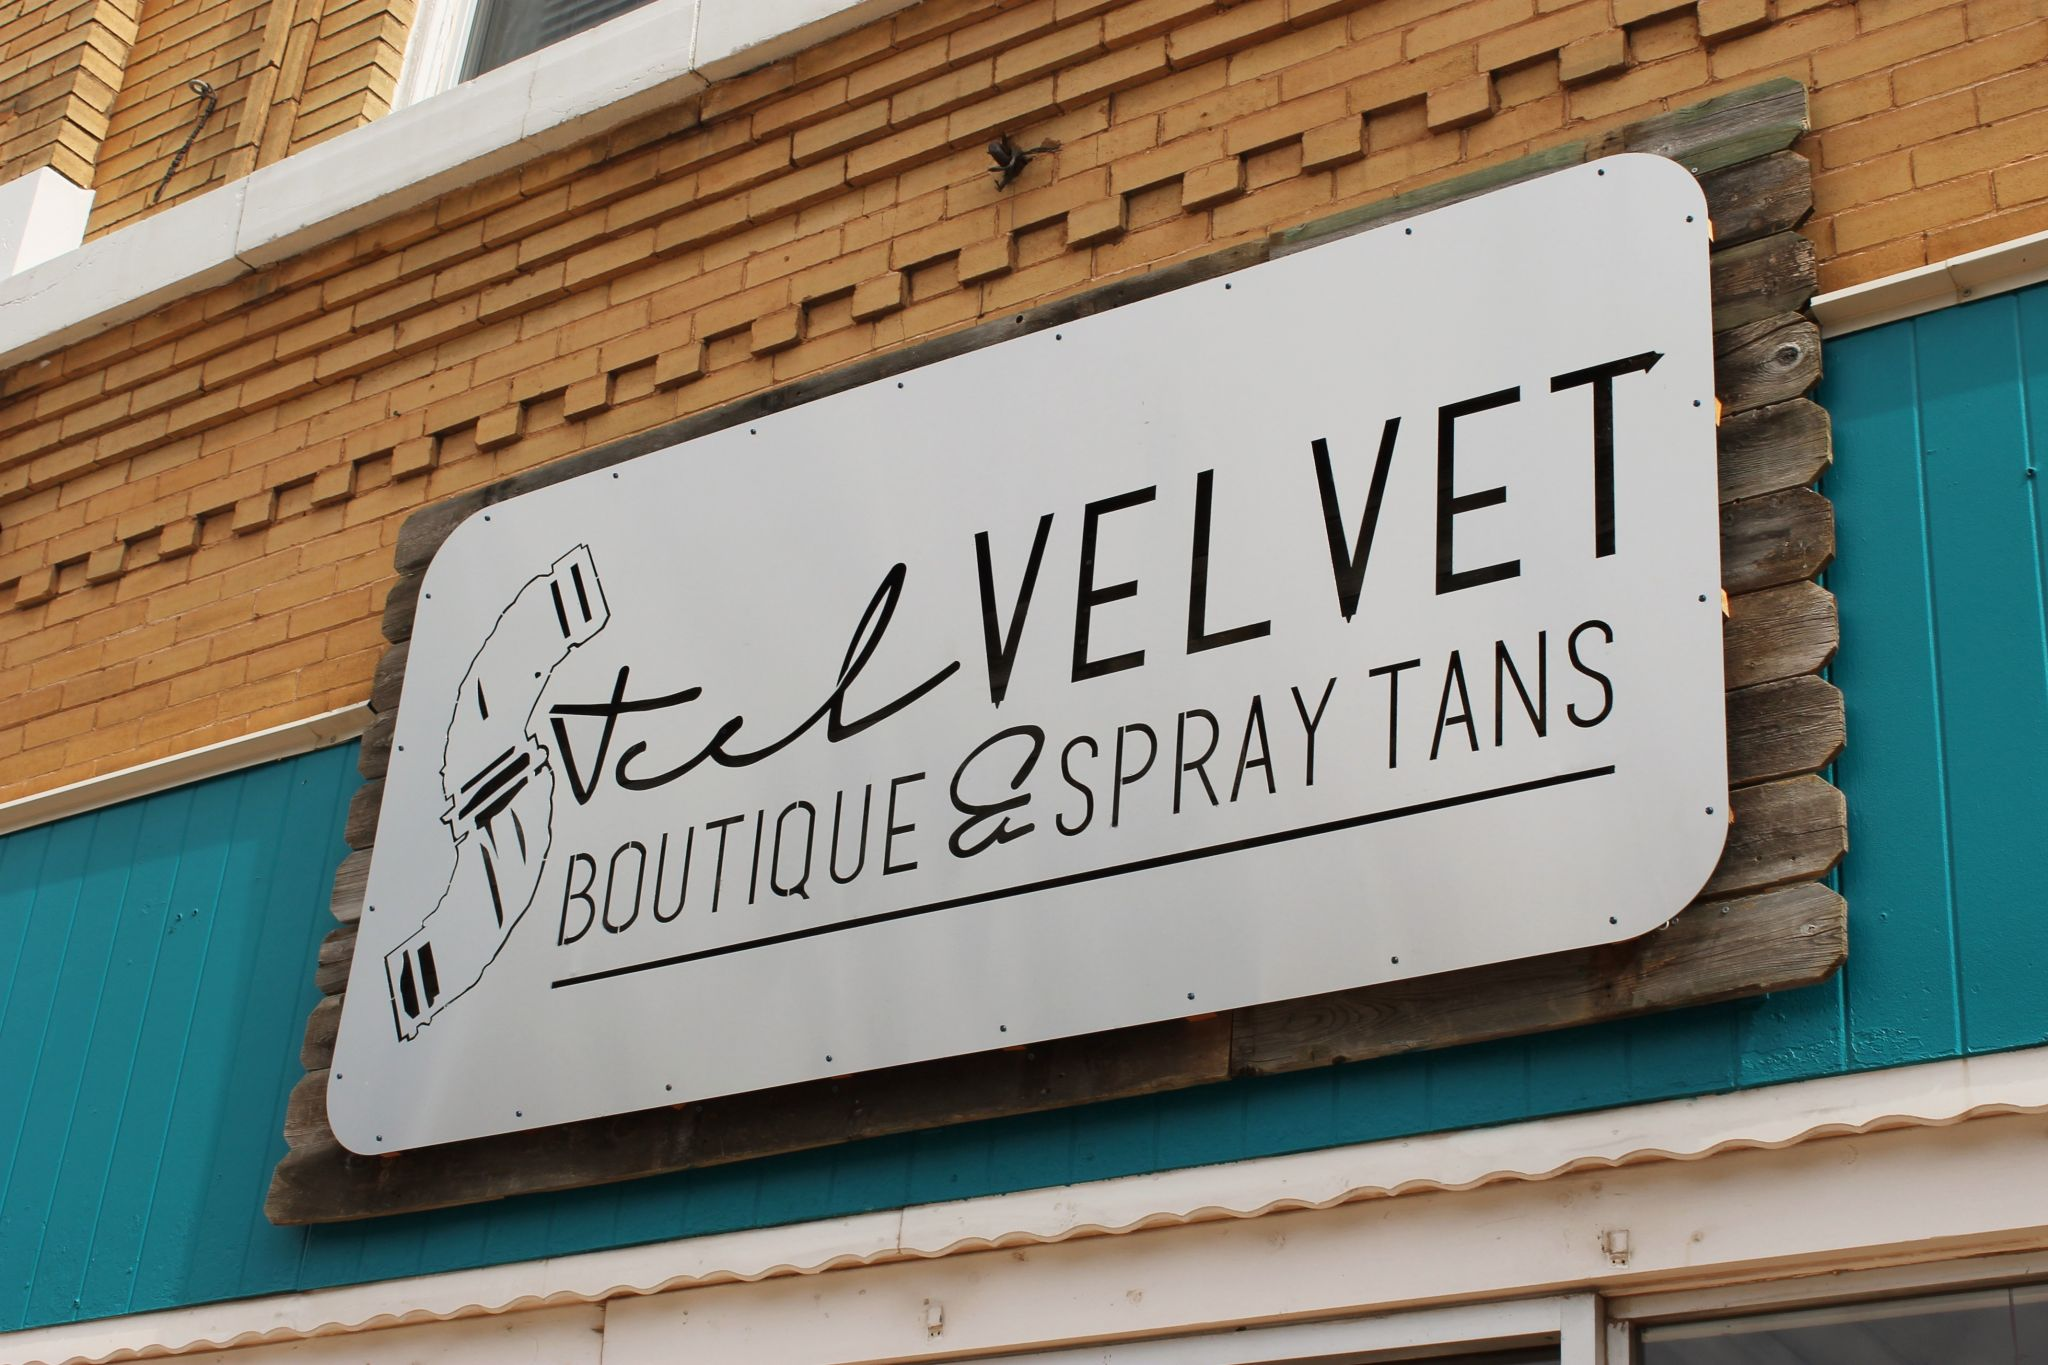 Steel Velvet boutique